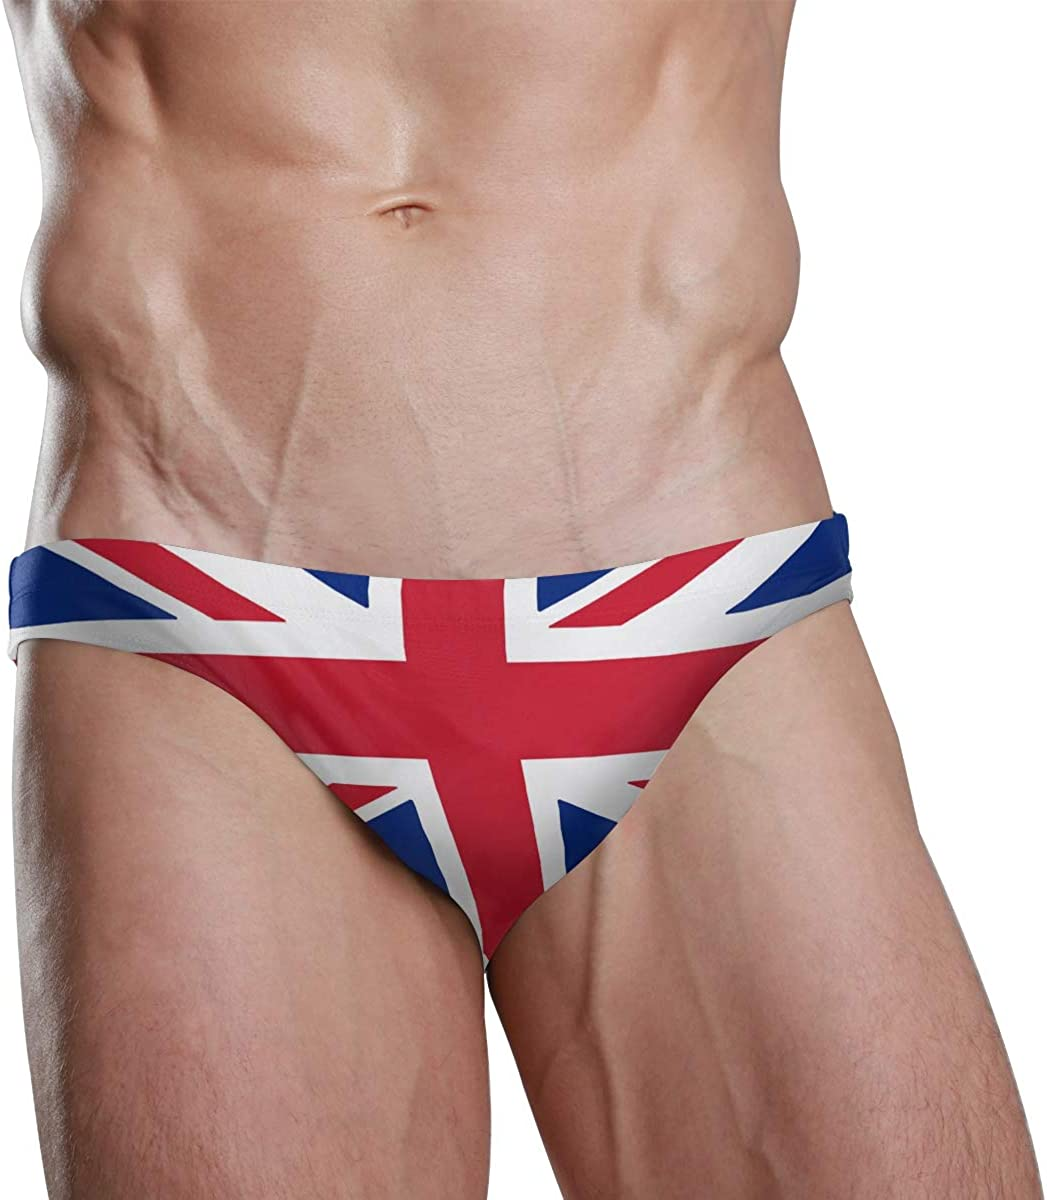 Cindly Mens Swim Briefs Trunk Scuba Dive Flag Athletic Swimsuit Beach Shorts Board Triangle Bikini Swimwear